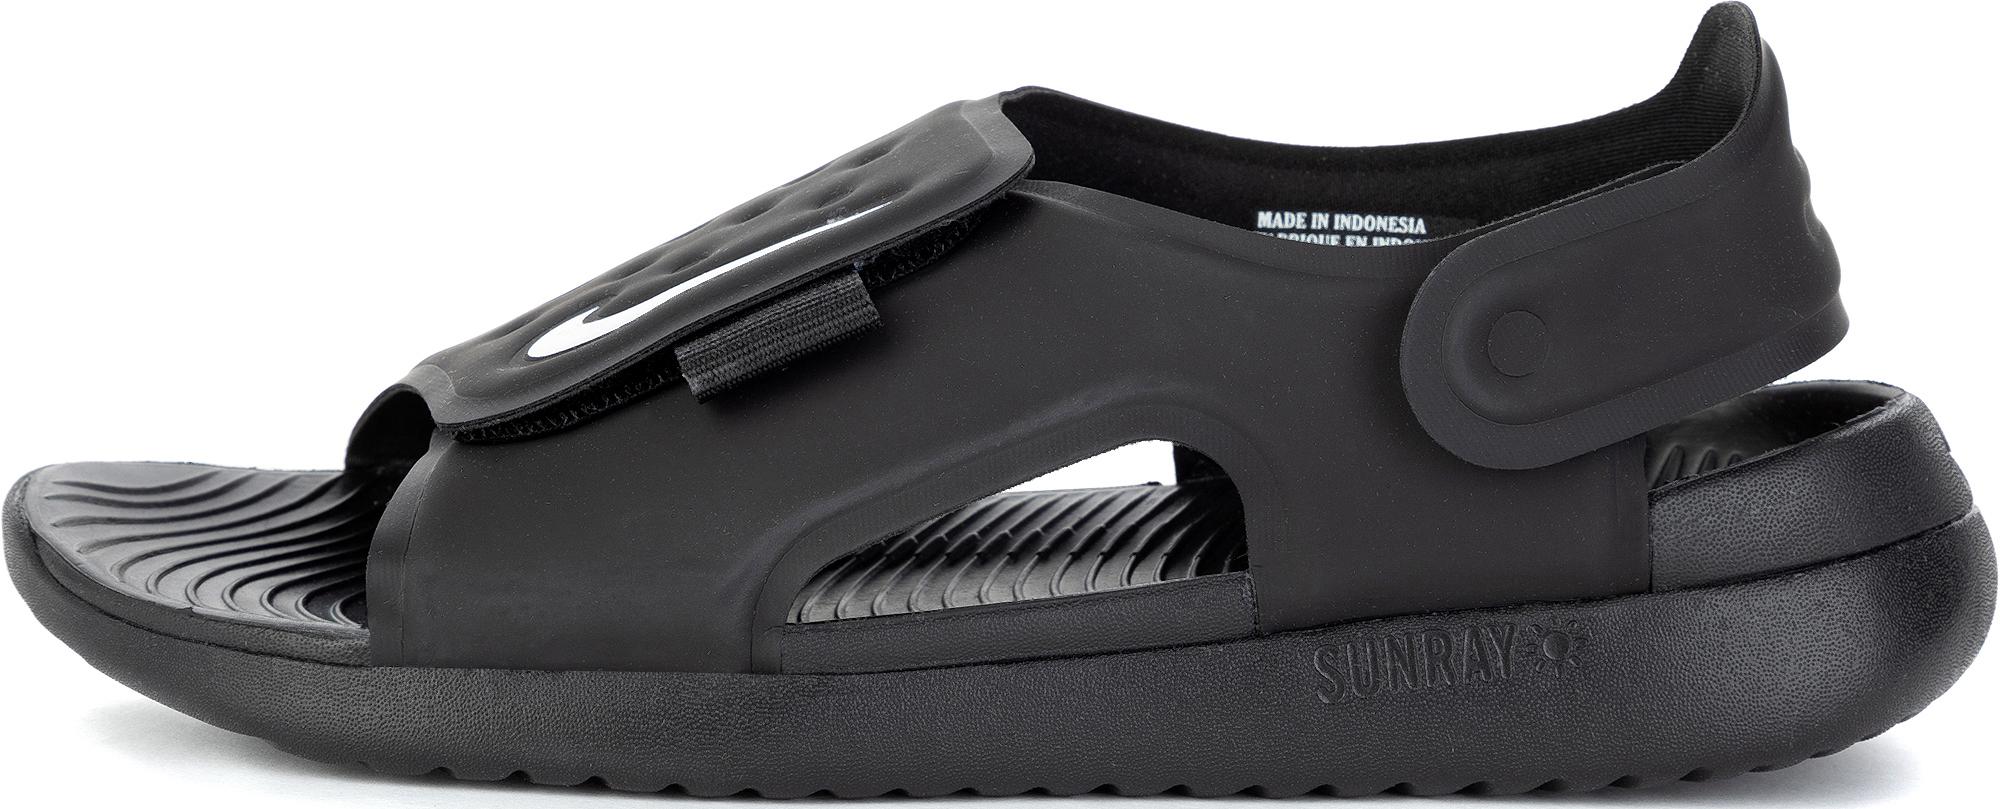 Nike Сандалии детские Nike Sunray Adjust 5, размер 35 сандалии детские roxy tw pebbles vi rainbow